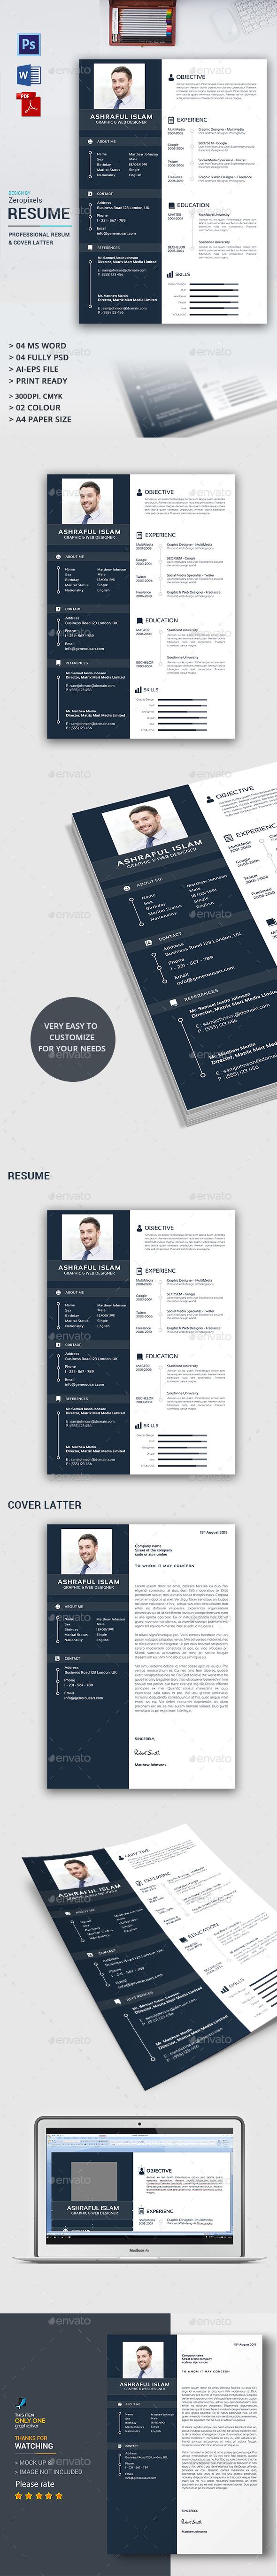 Resume cv photoshop psd infographic cv elegant available resume cv photoshop psd infographic cv elegant available here https yelopaper Image collections